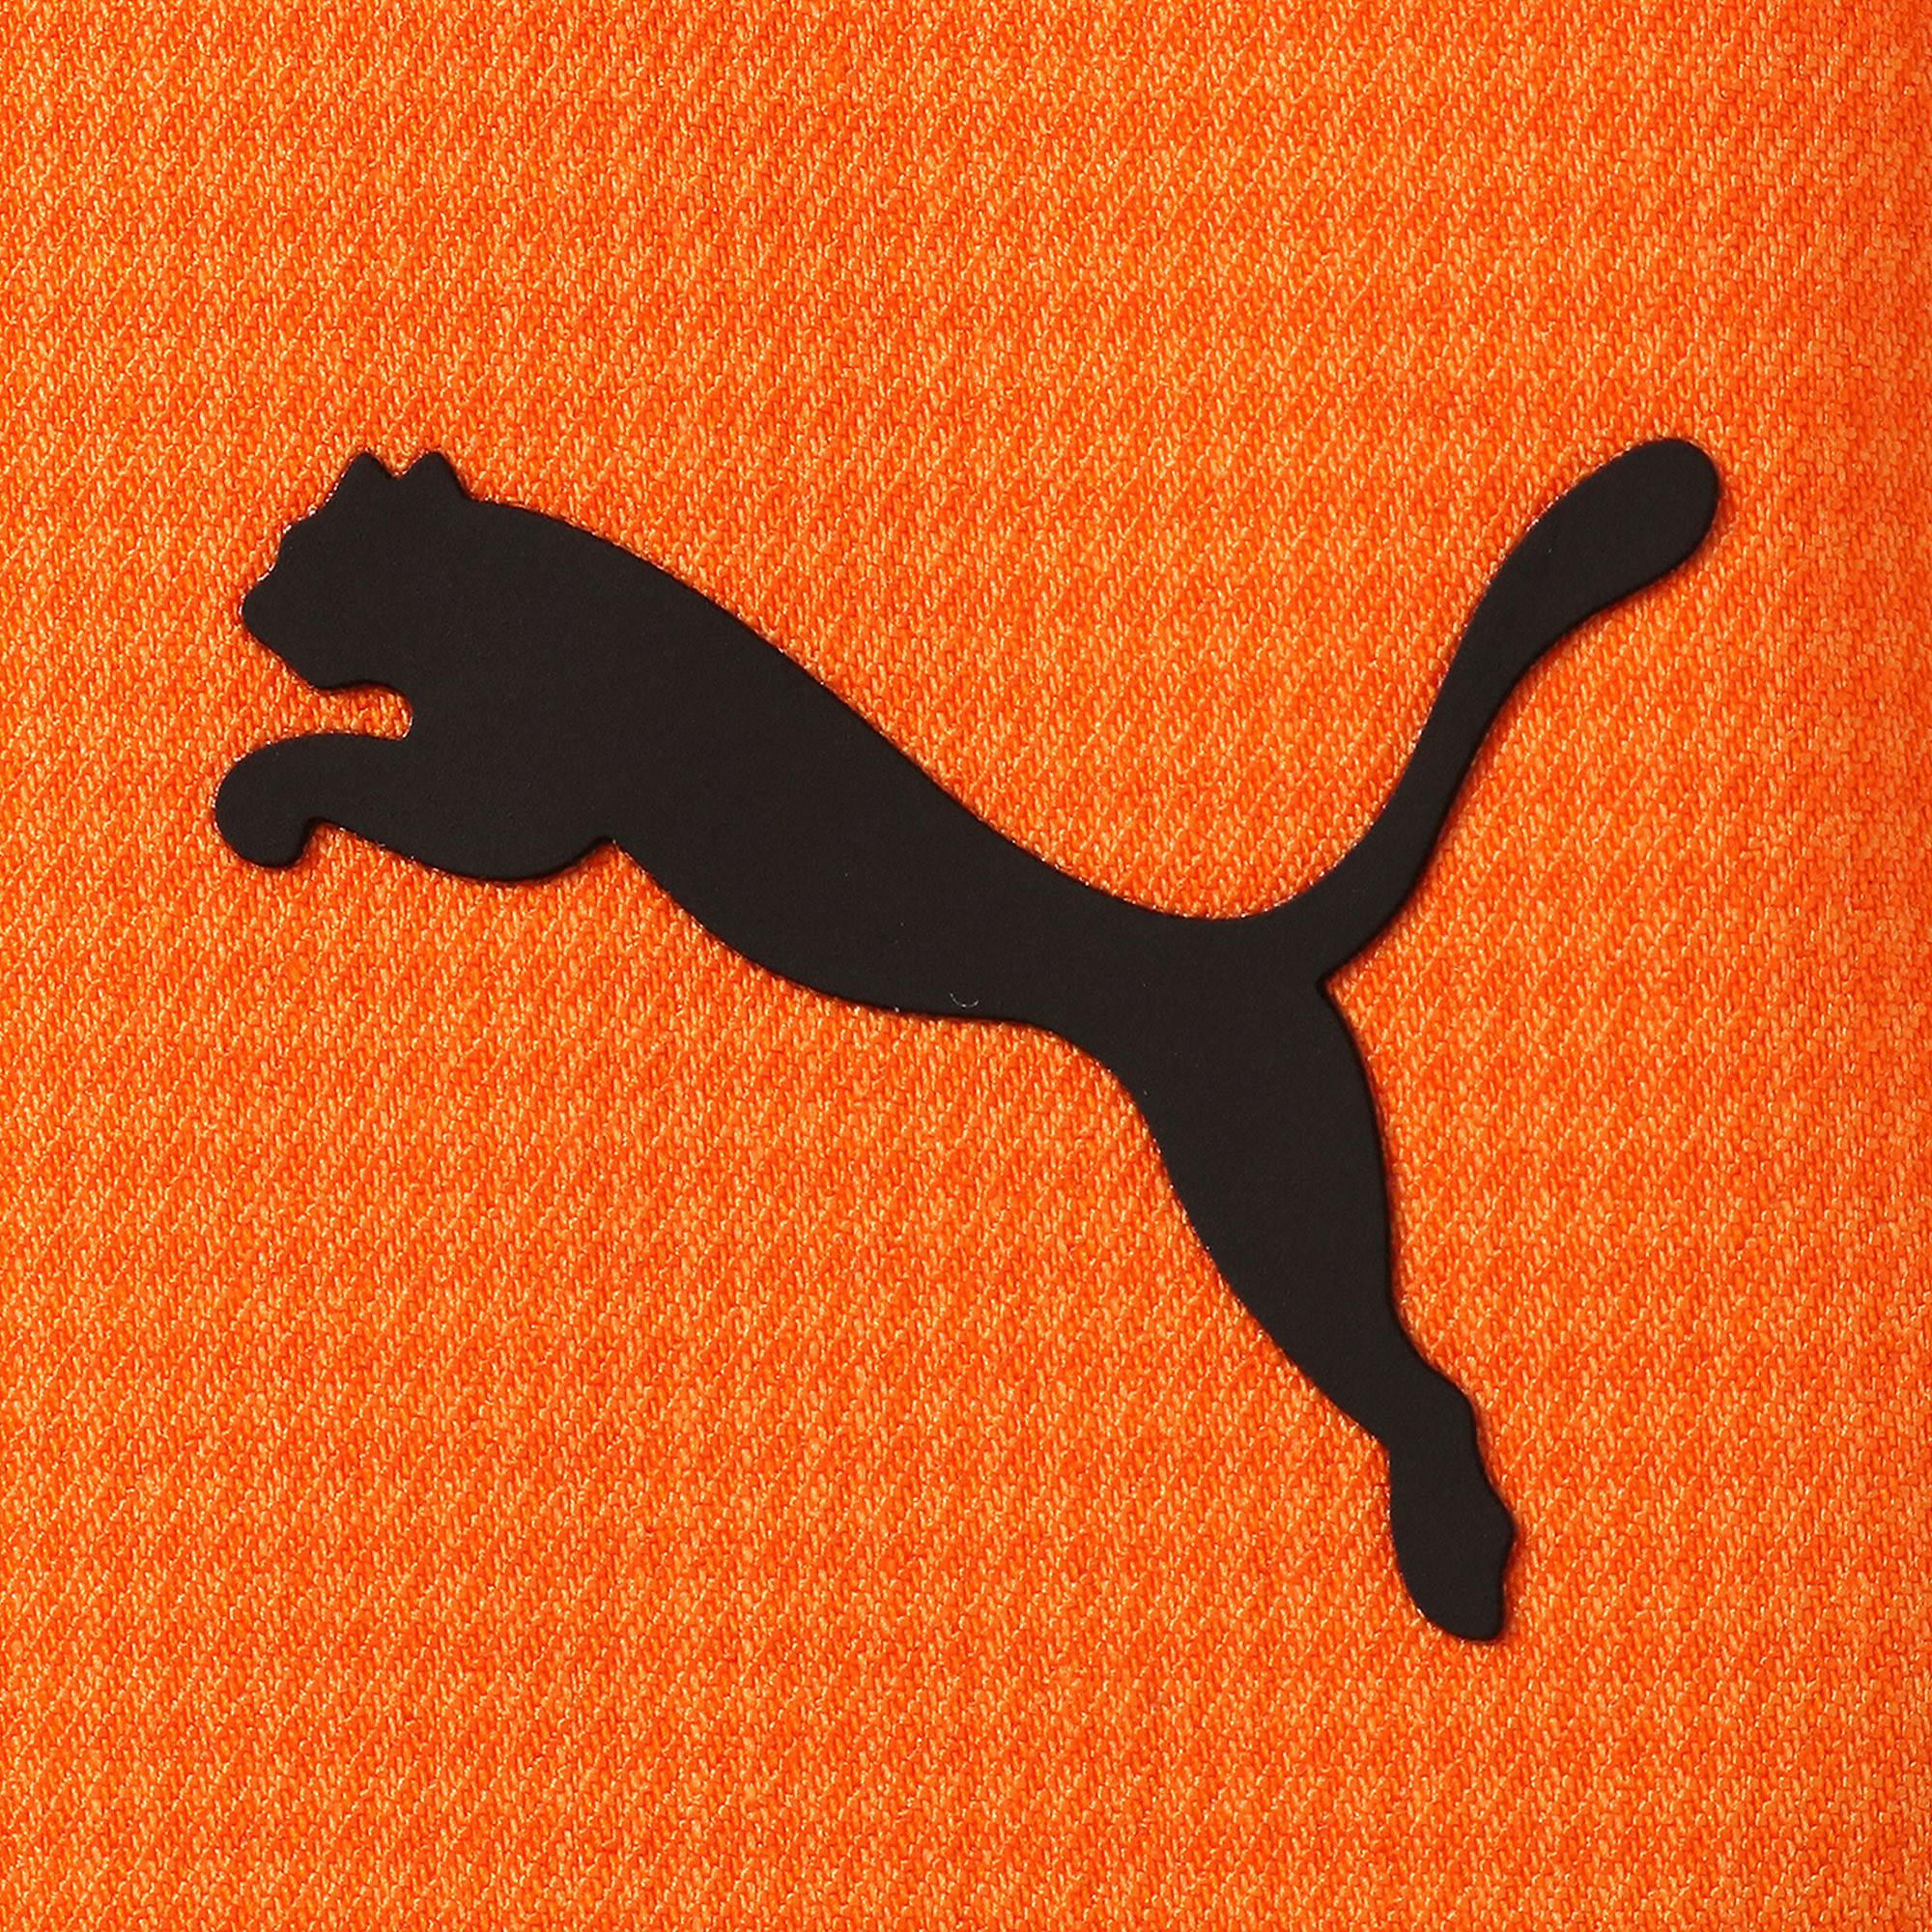 Thumbnail 4 of ゴルフ フュージョン 3Dテーパードパンツ, Vibrant Orange, medium-JPN